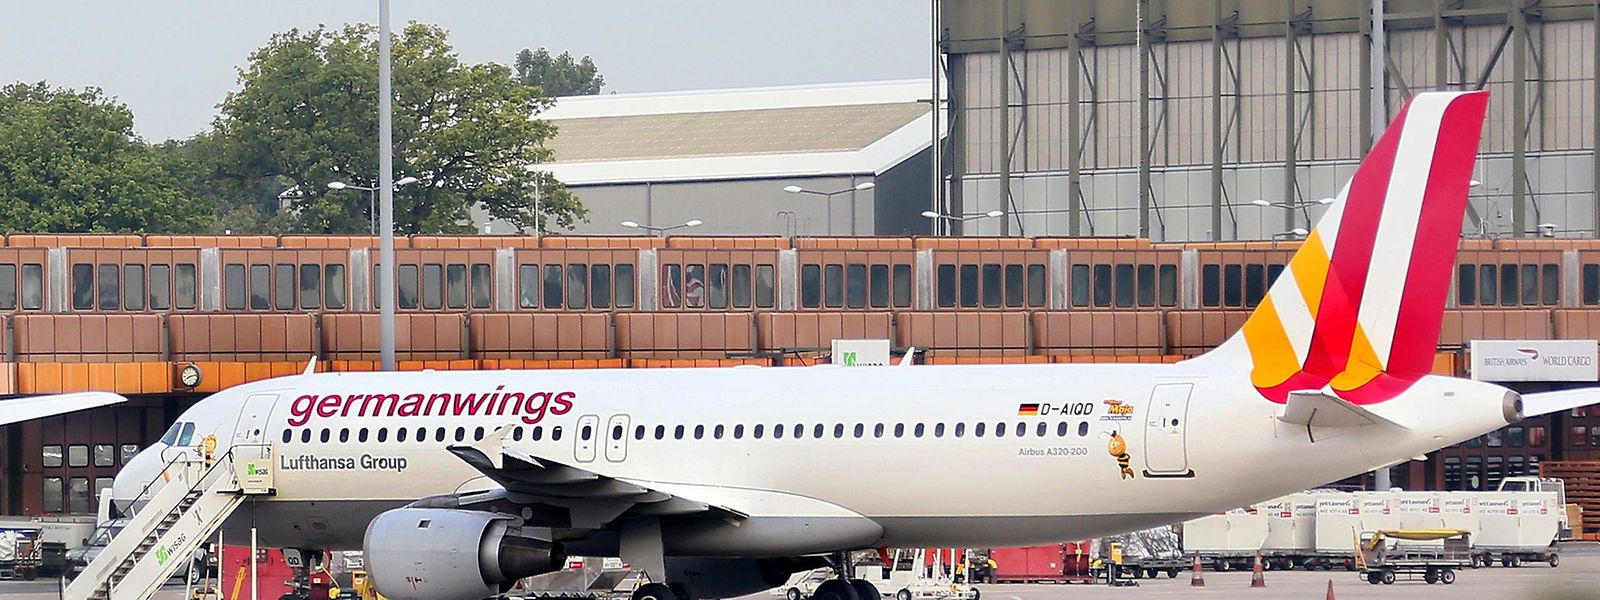 Un Airbus A320 le 29 août 2014 à l'aéroport de Berlin Tegel